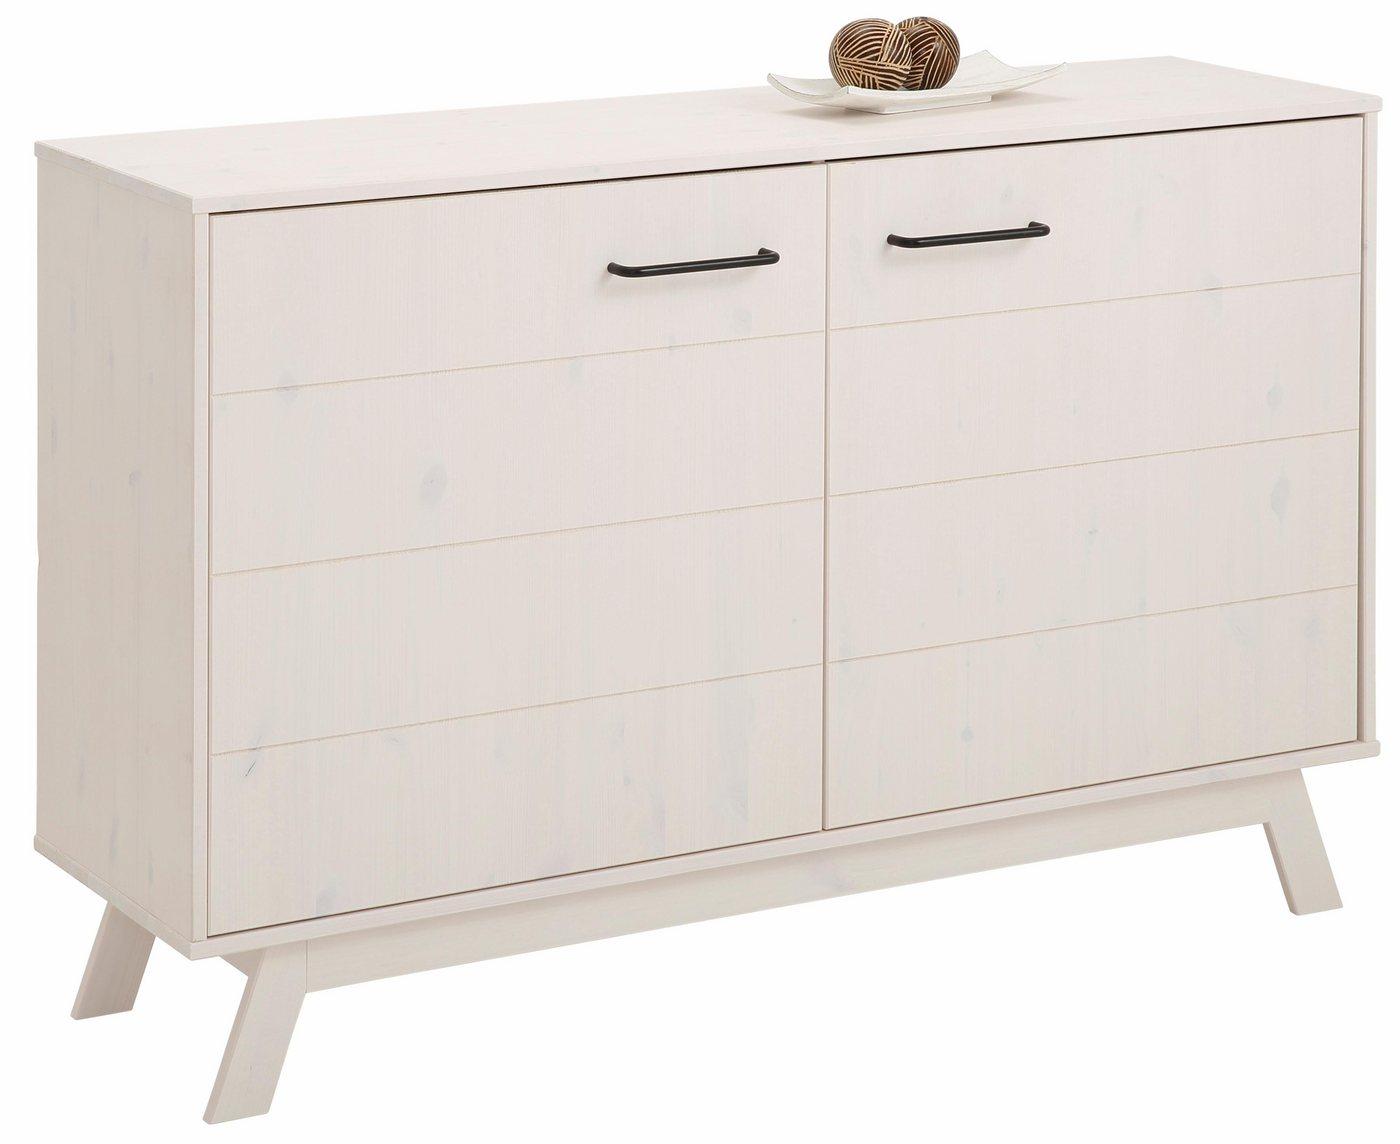 HOME AFFAIRE dressoir New Nordic, breedte 130 cm